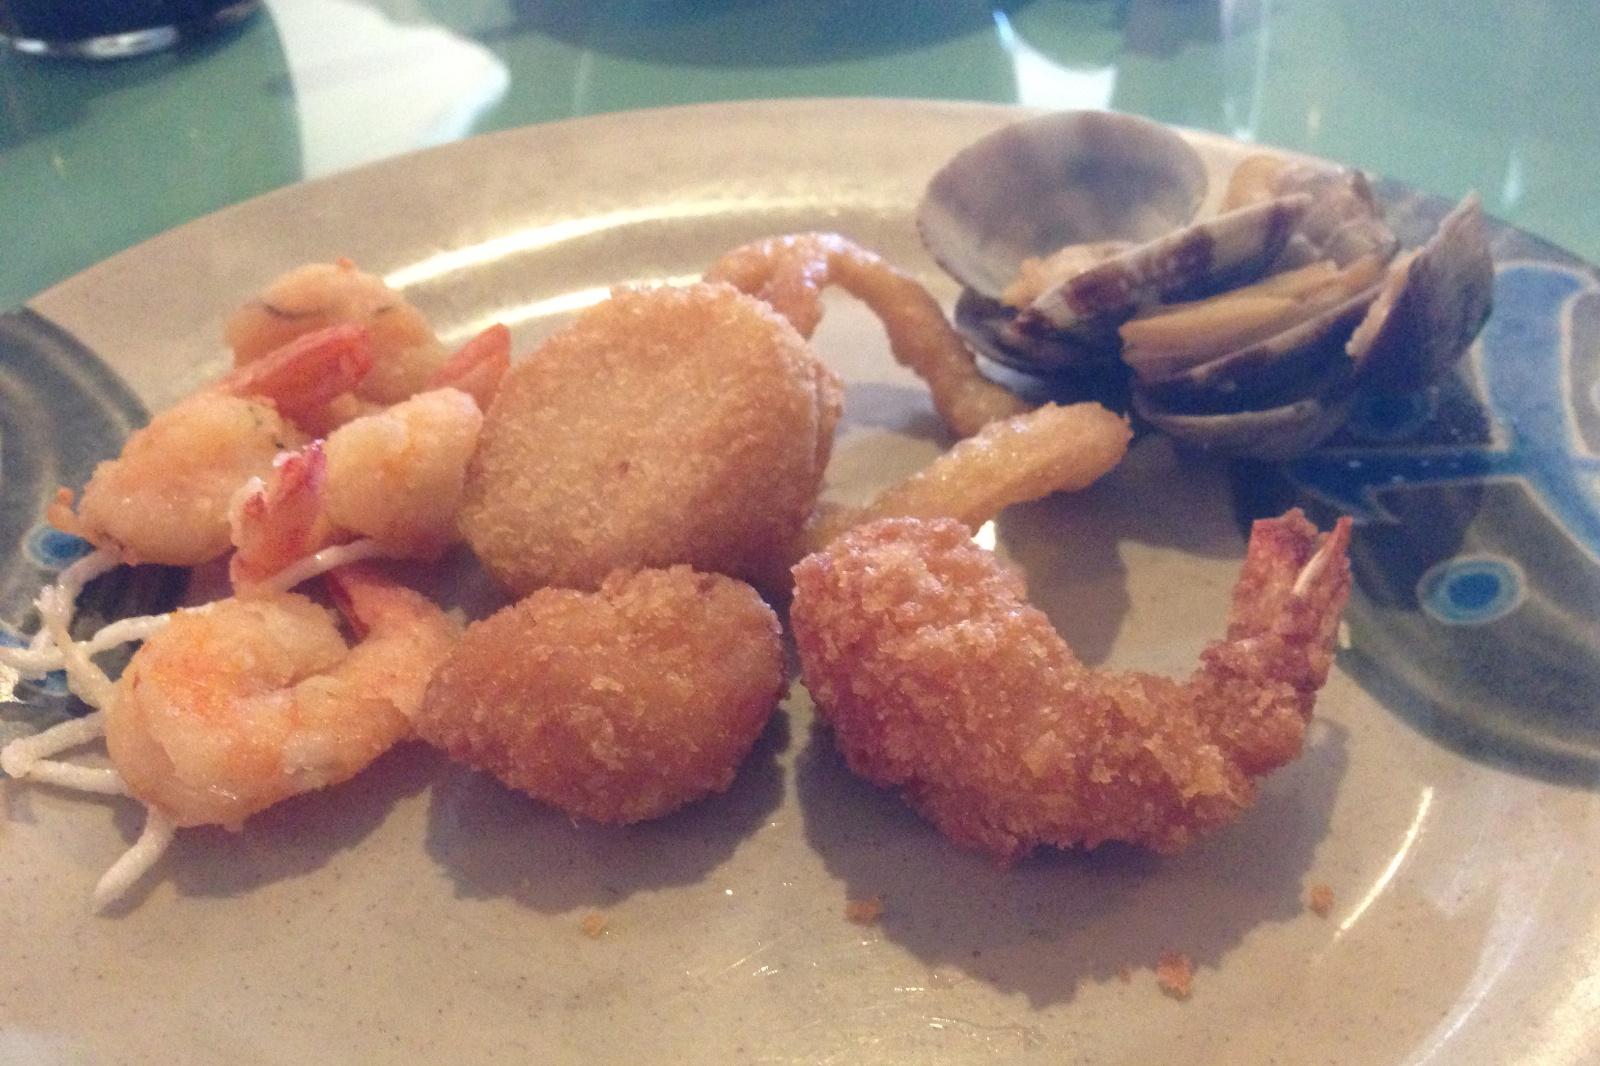 http://blog.rickk.com/food/2014/07/27/ate.2014.07.27.d2.jpg